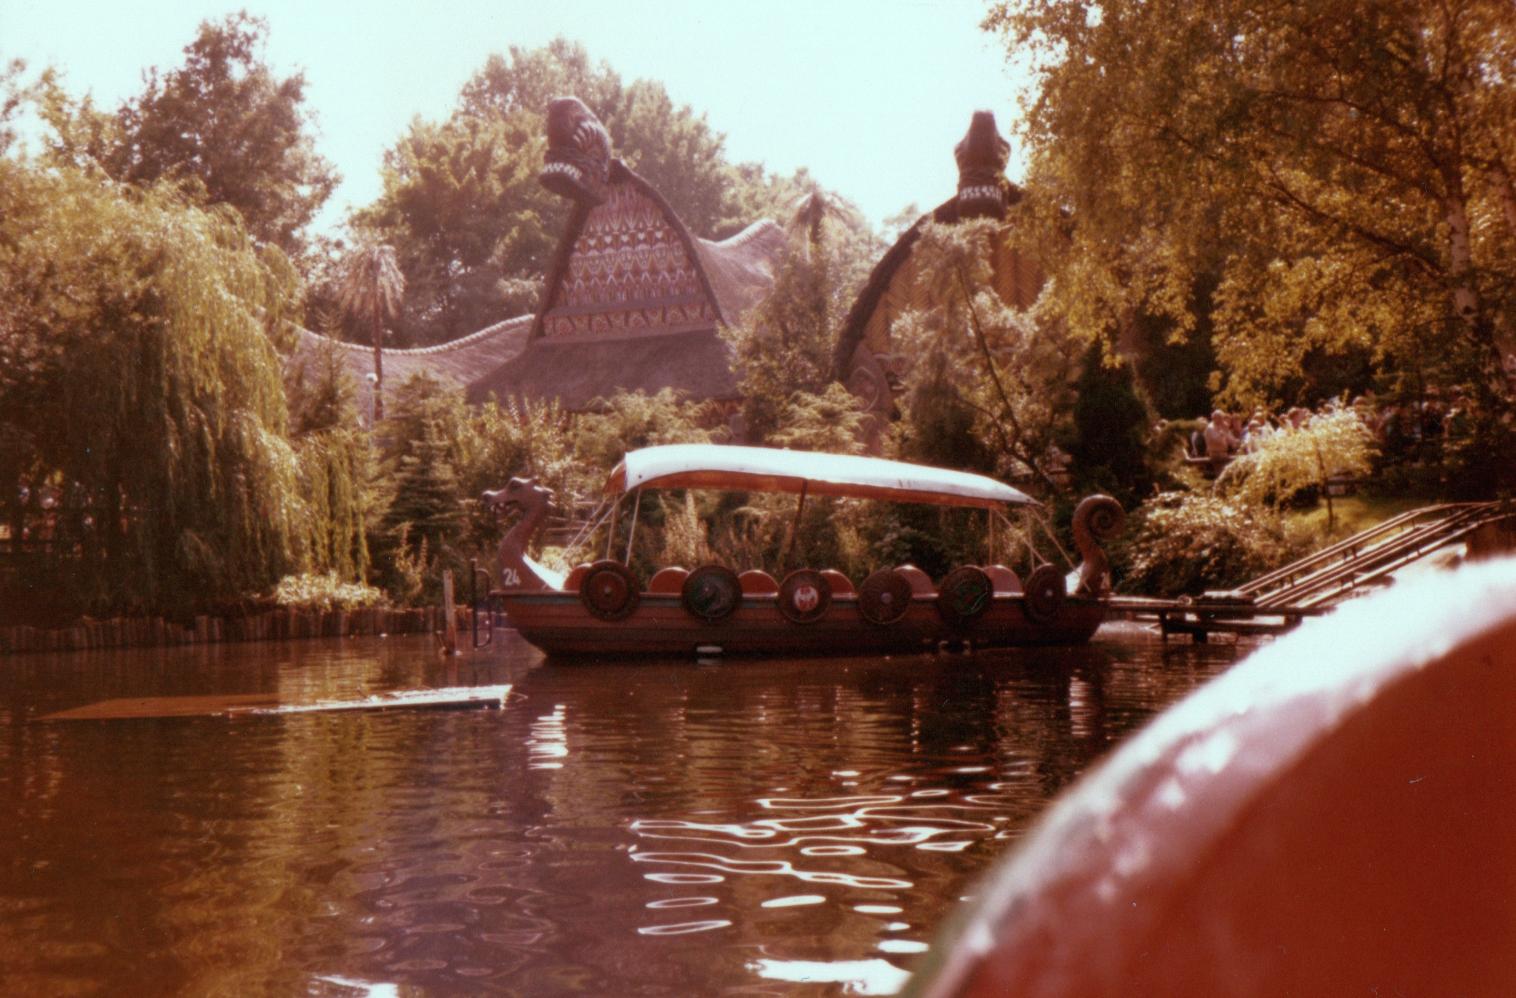 [Tokyo Disneyland] Jungle Cruise : Wildlife Expeditions (8 septembre 2014) - Page 2 Phantasialand_Wikinger_Bootsfahrt1981